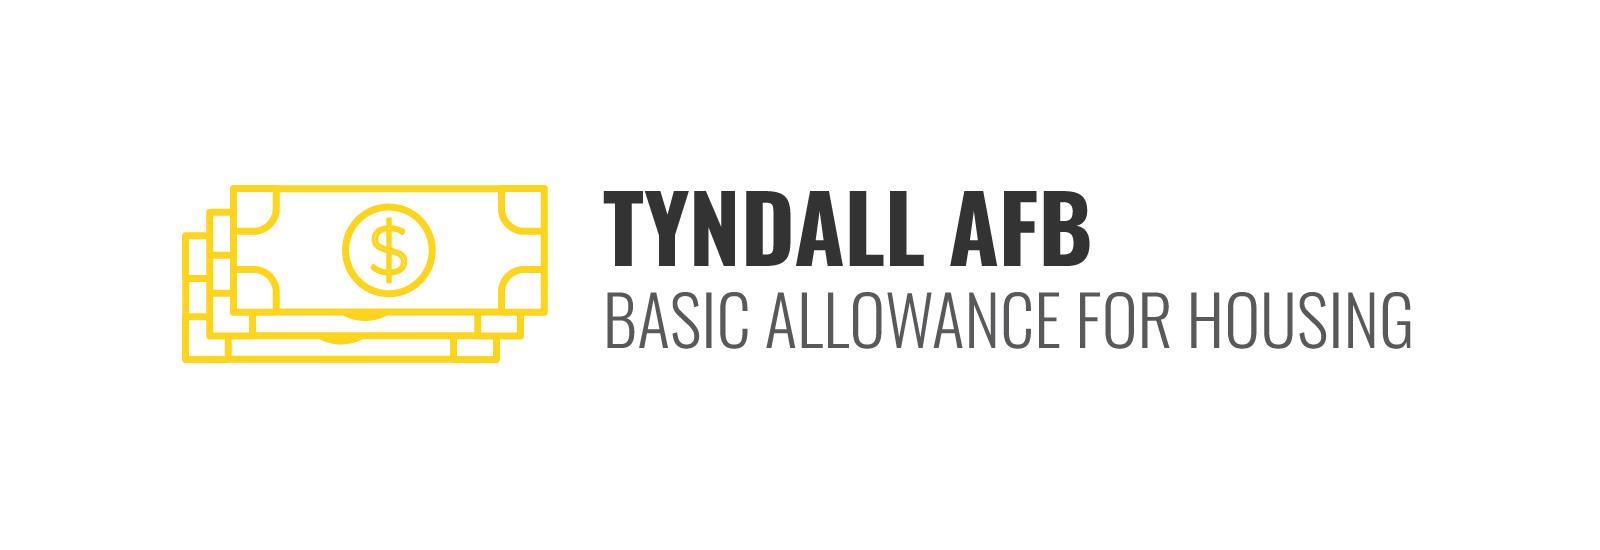 Tyndall AFB BAH